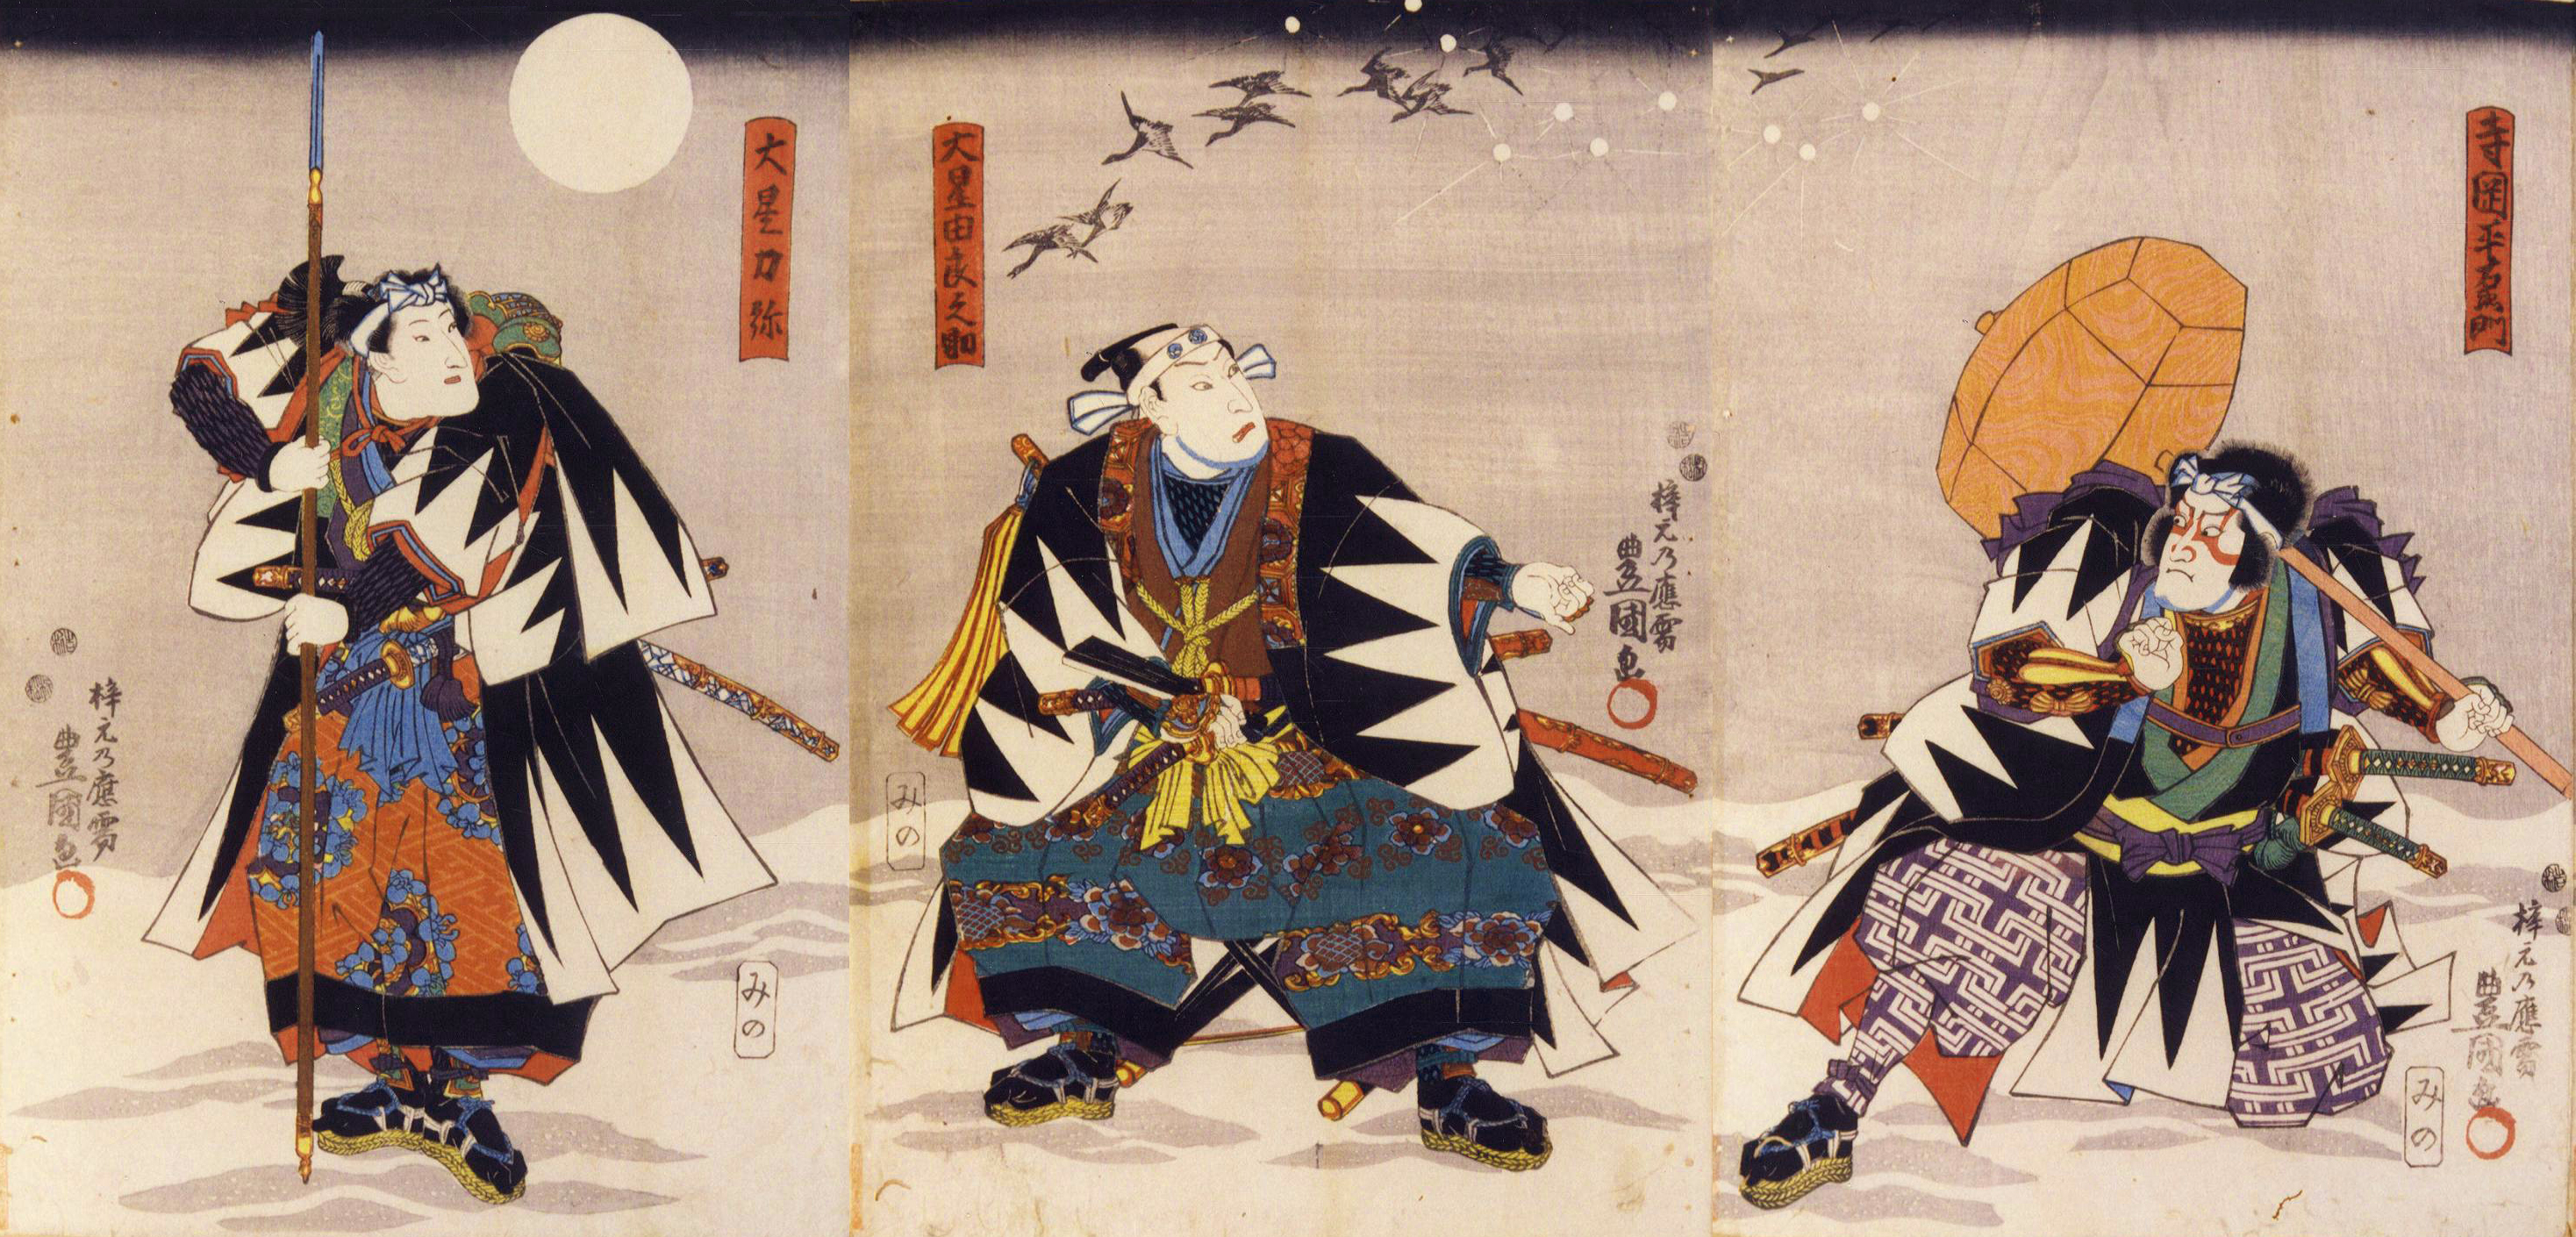 http://upload.wikimedia.org/wikipedia/commons/8/8c/Kanadehon_Ch%C5%ABshingura_by_Toyokuni_Utagawa_III.jpg